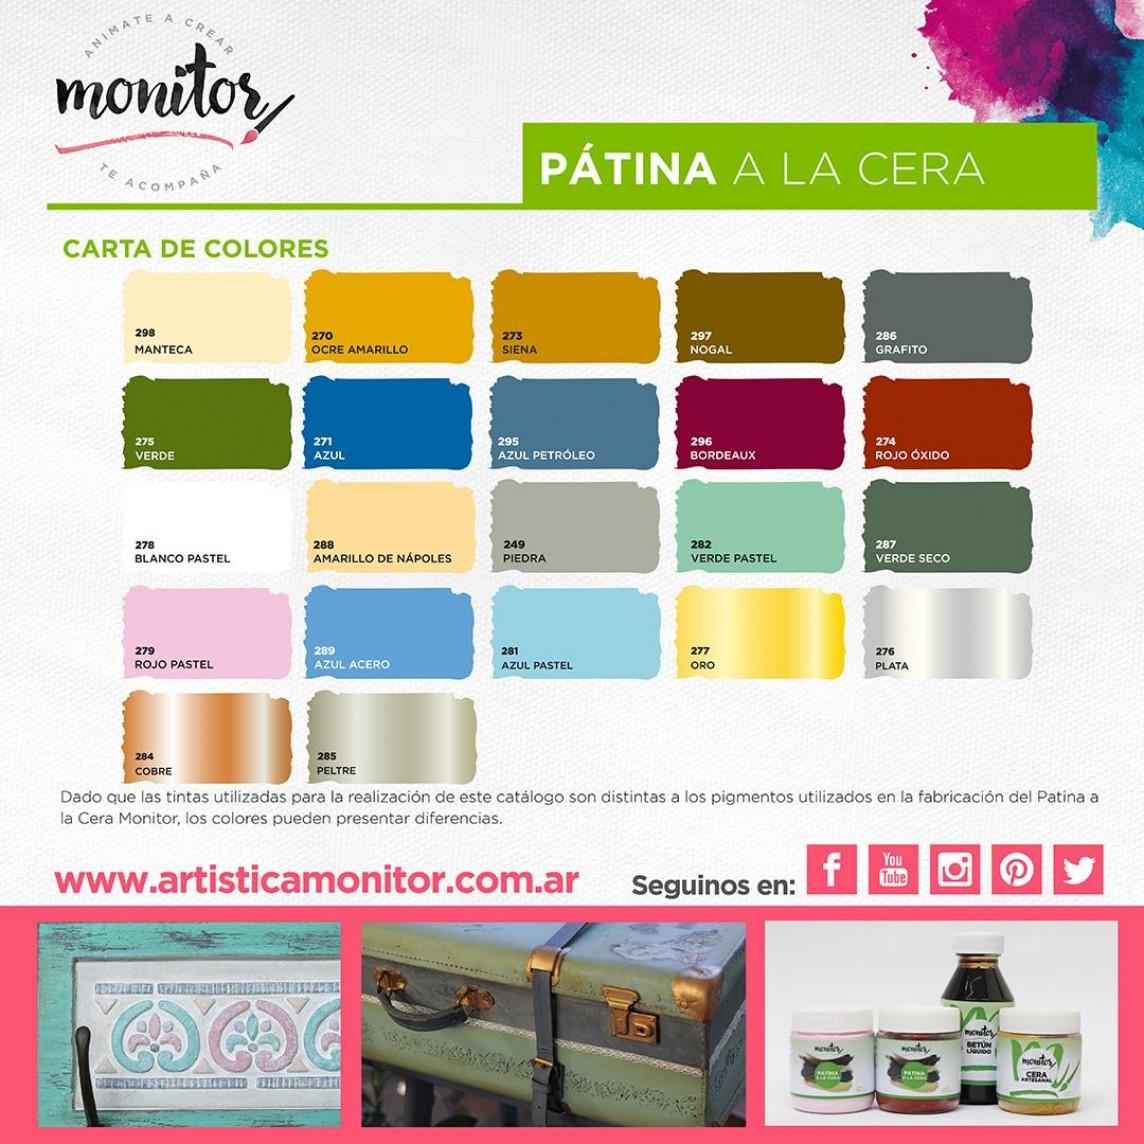 Carta de colores para Pátina a la cera